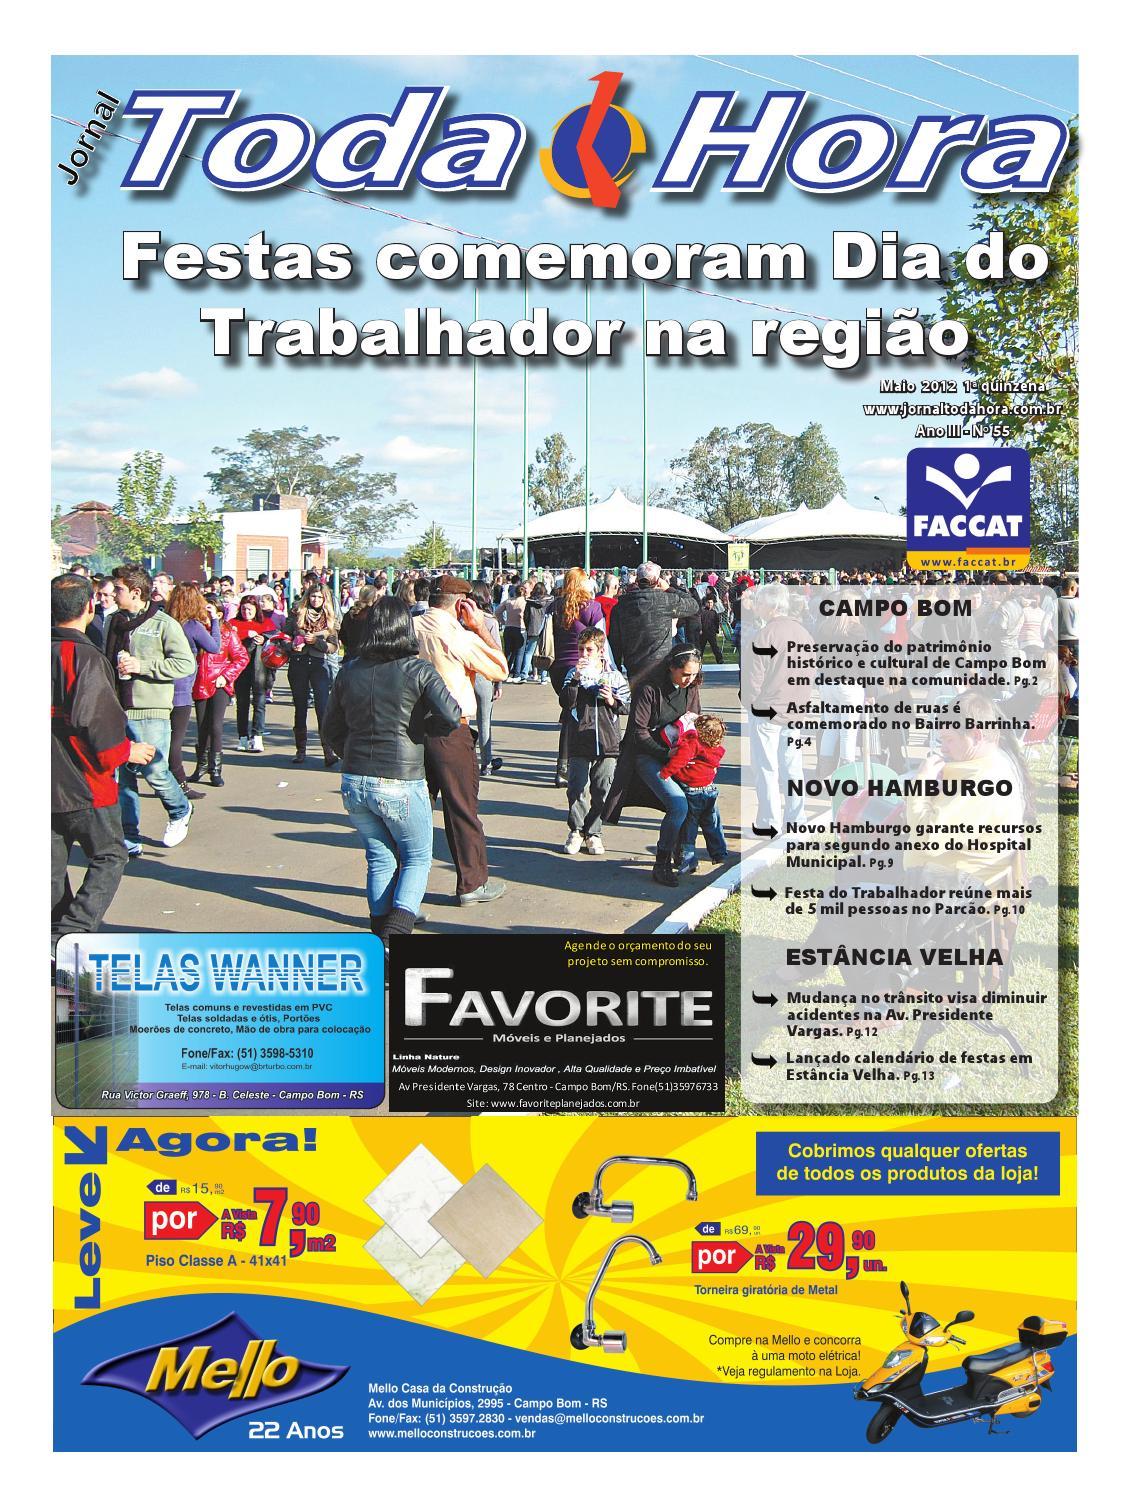 f22b3f2e1 MAIO 2012 1 by Jornal Toda Hora - issuu